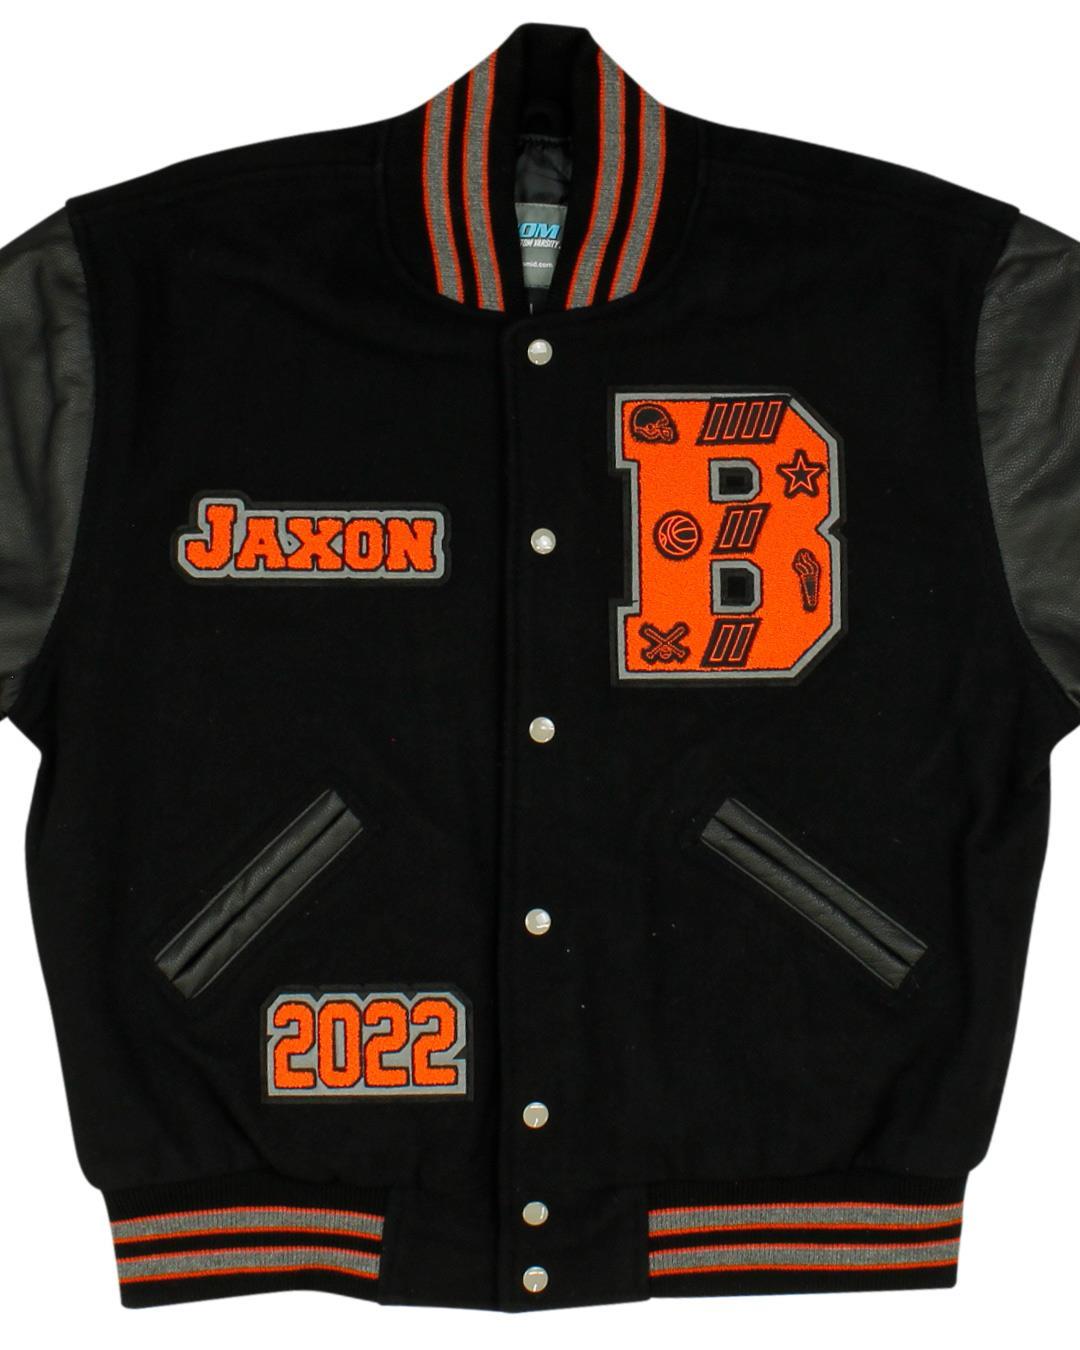 Blaine High School Letterman Jacket, Blaine WA - Front